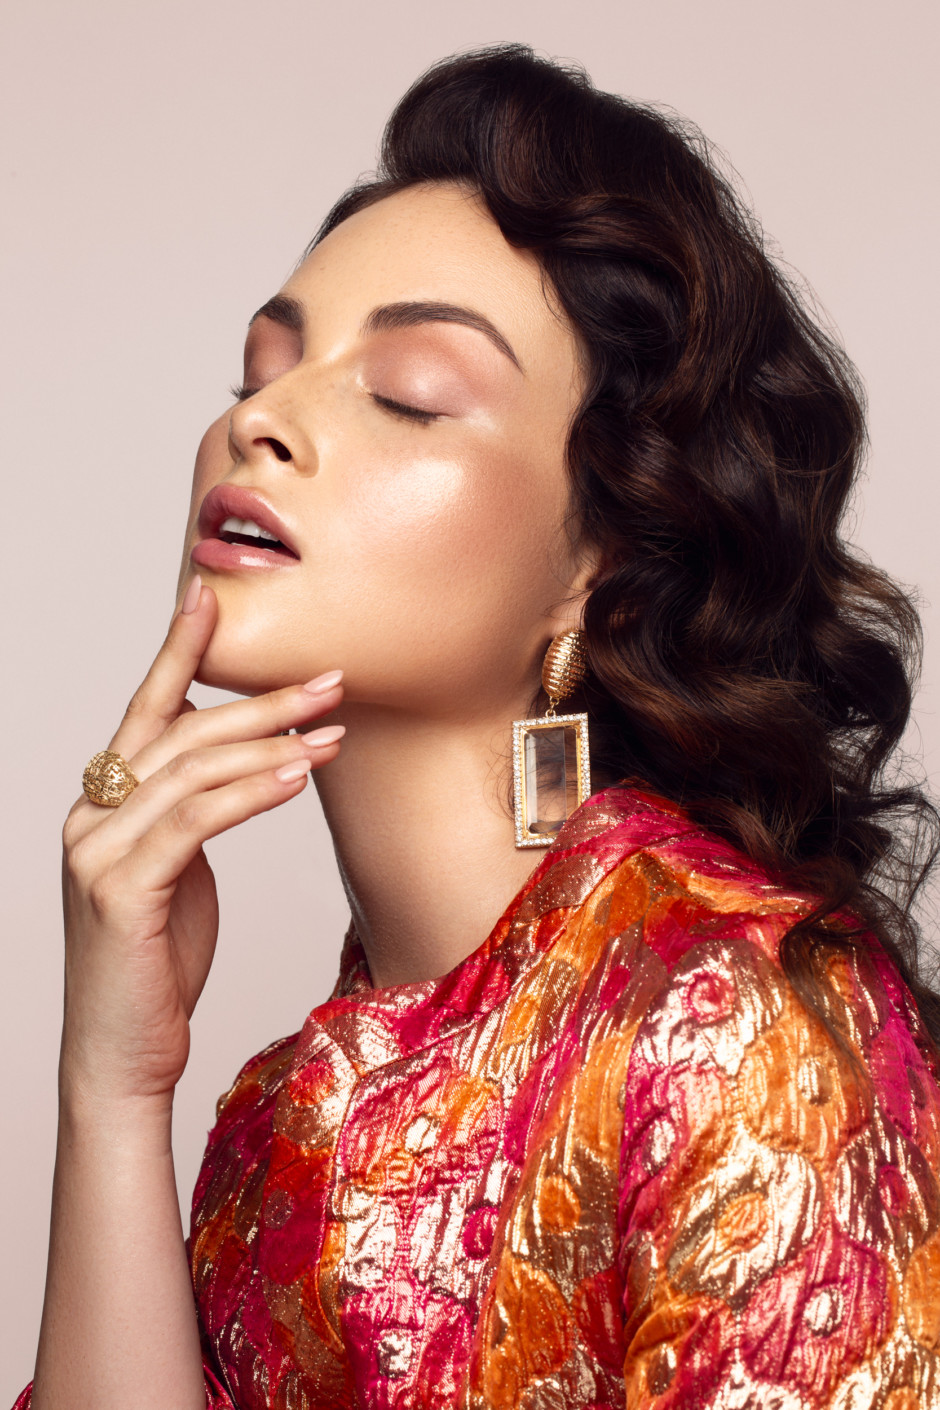 Nicole Beauty Fashion Low Res-8